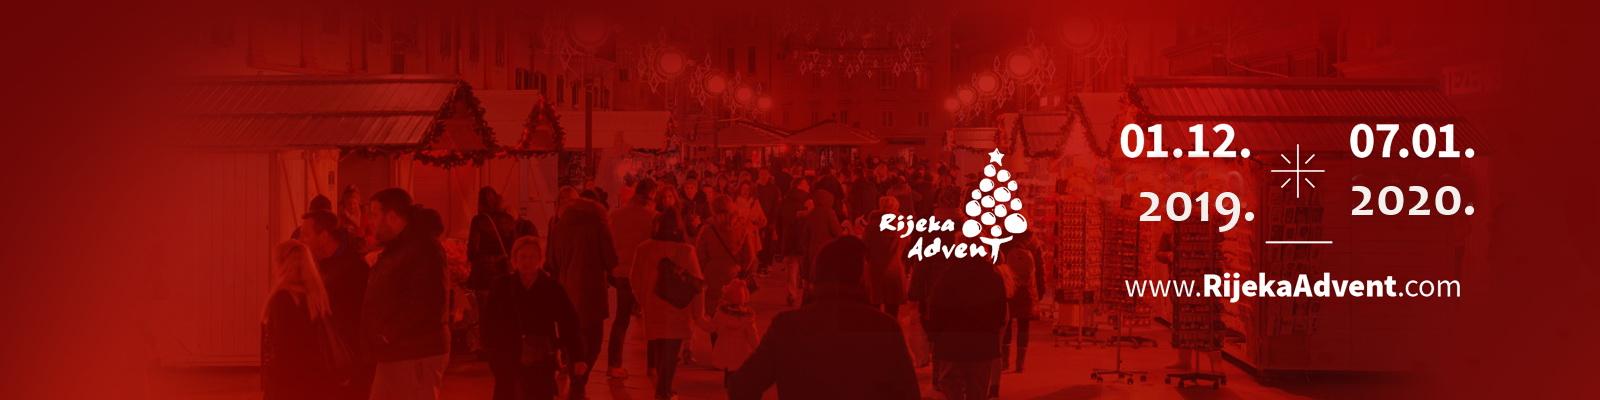 Rijeka-Advent 2019.